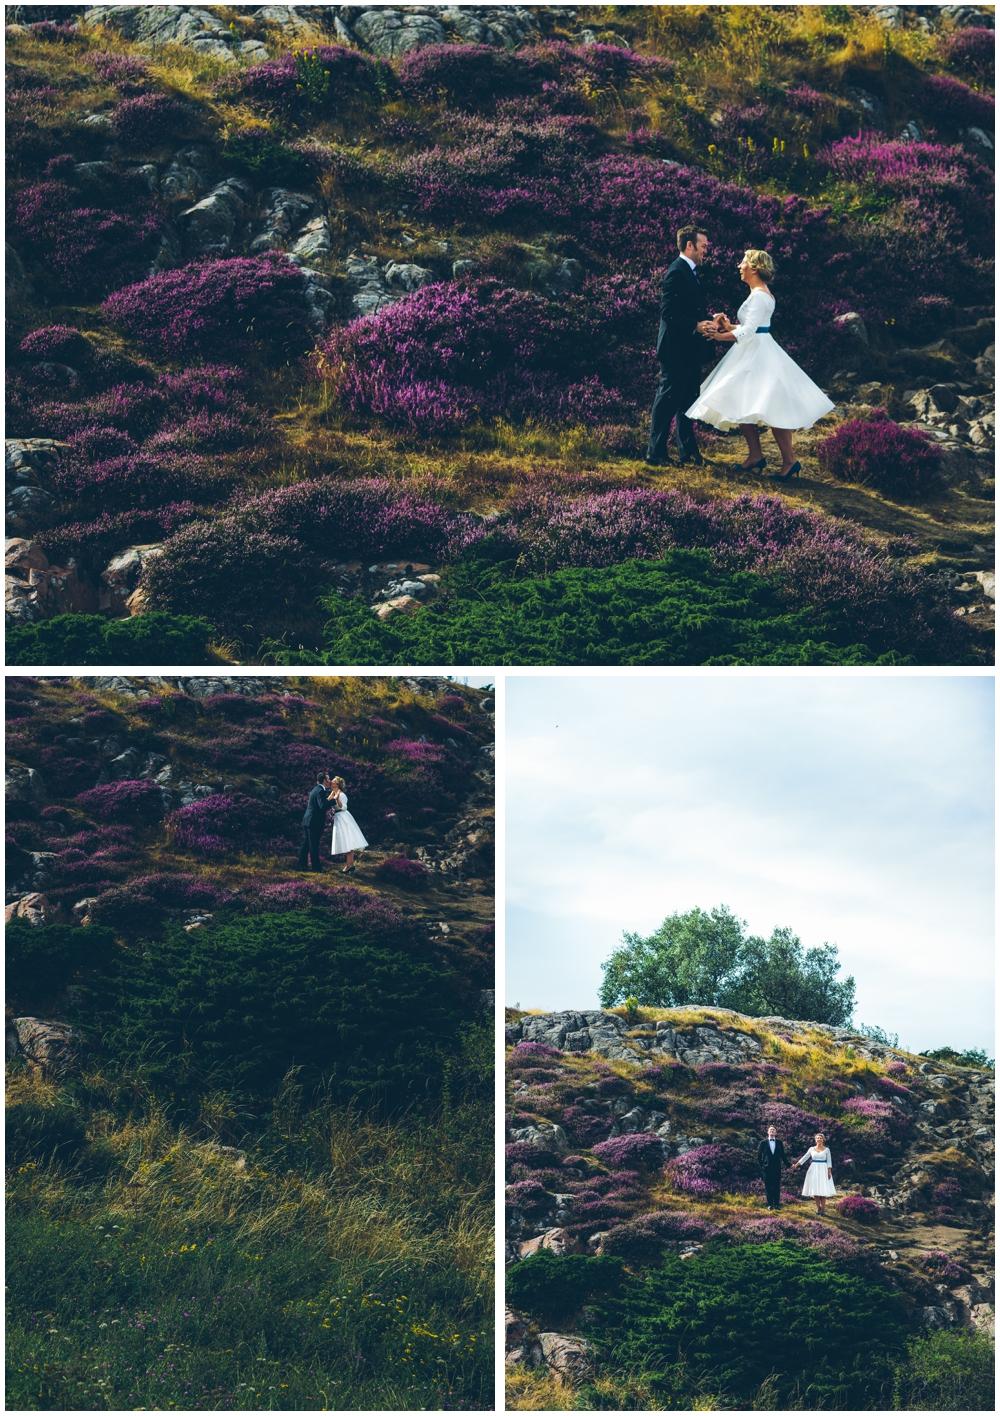 LE HAI LINH Photography-Hochzeitsfotograf-afterweddingshooting-malmoe-schweden_0077.jpg0077.jpg